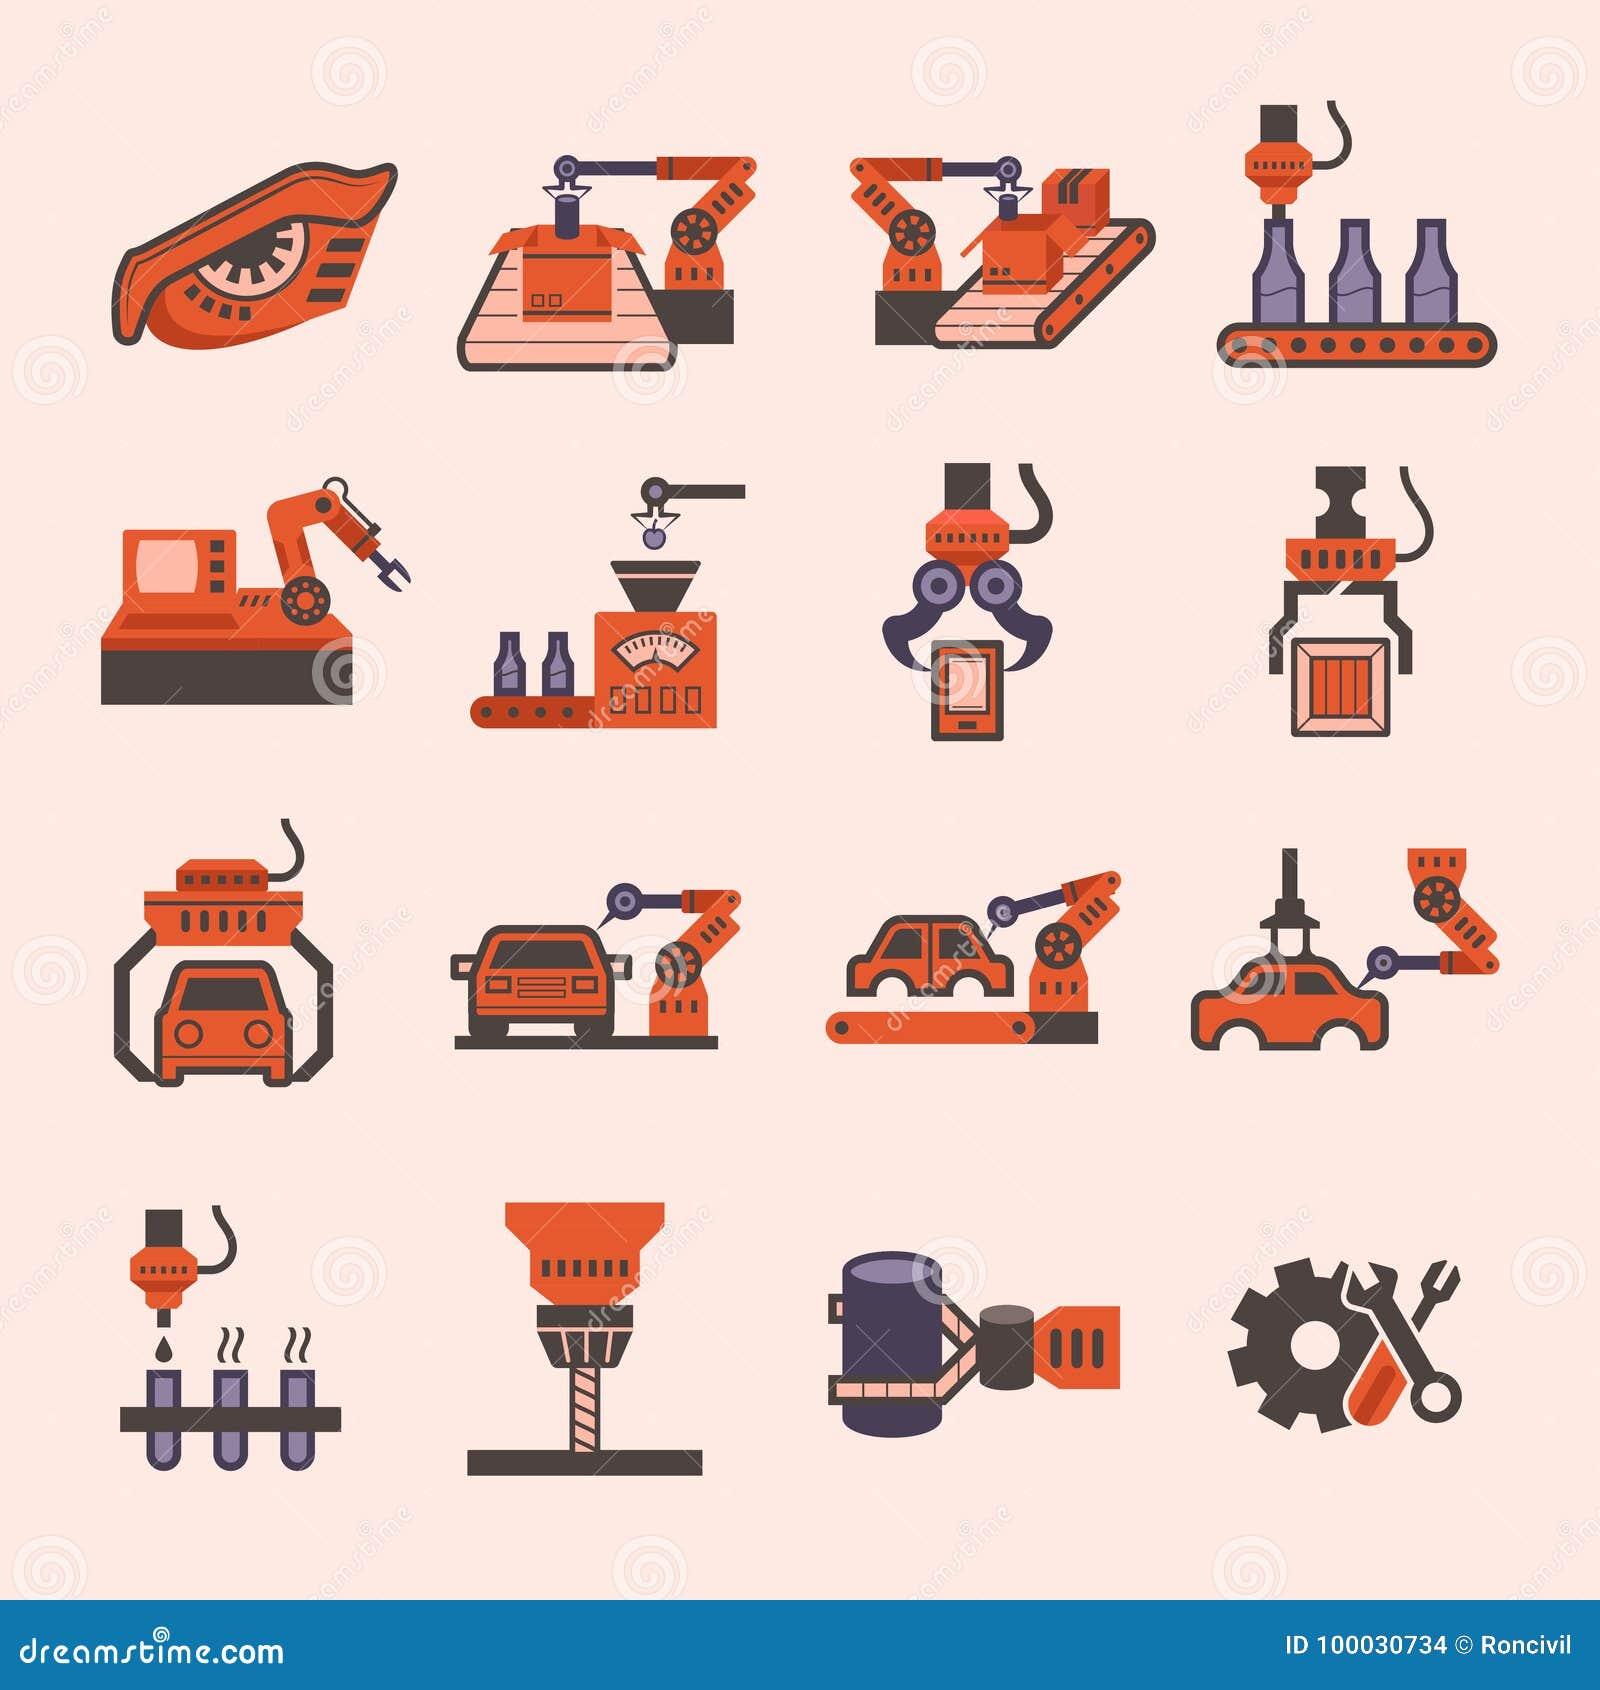 Robot Vector Icon Stock Vector Illustration Of Equipment 100030734